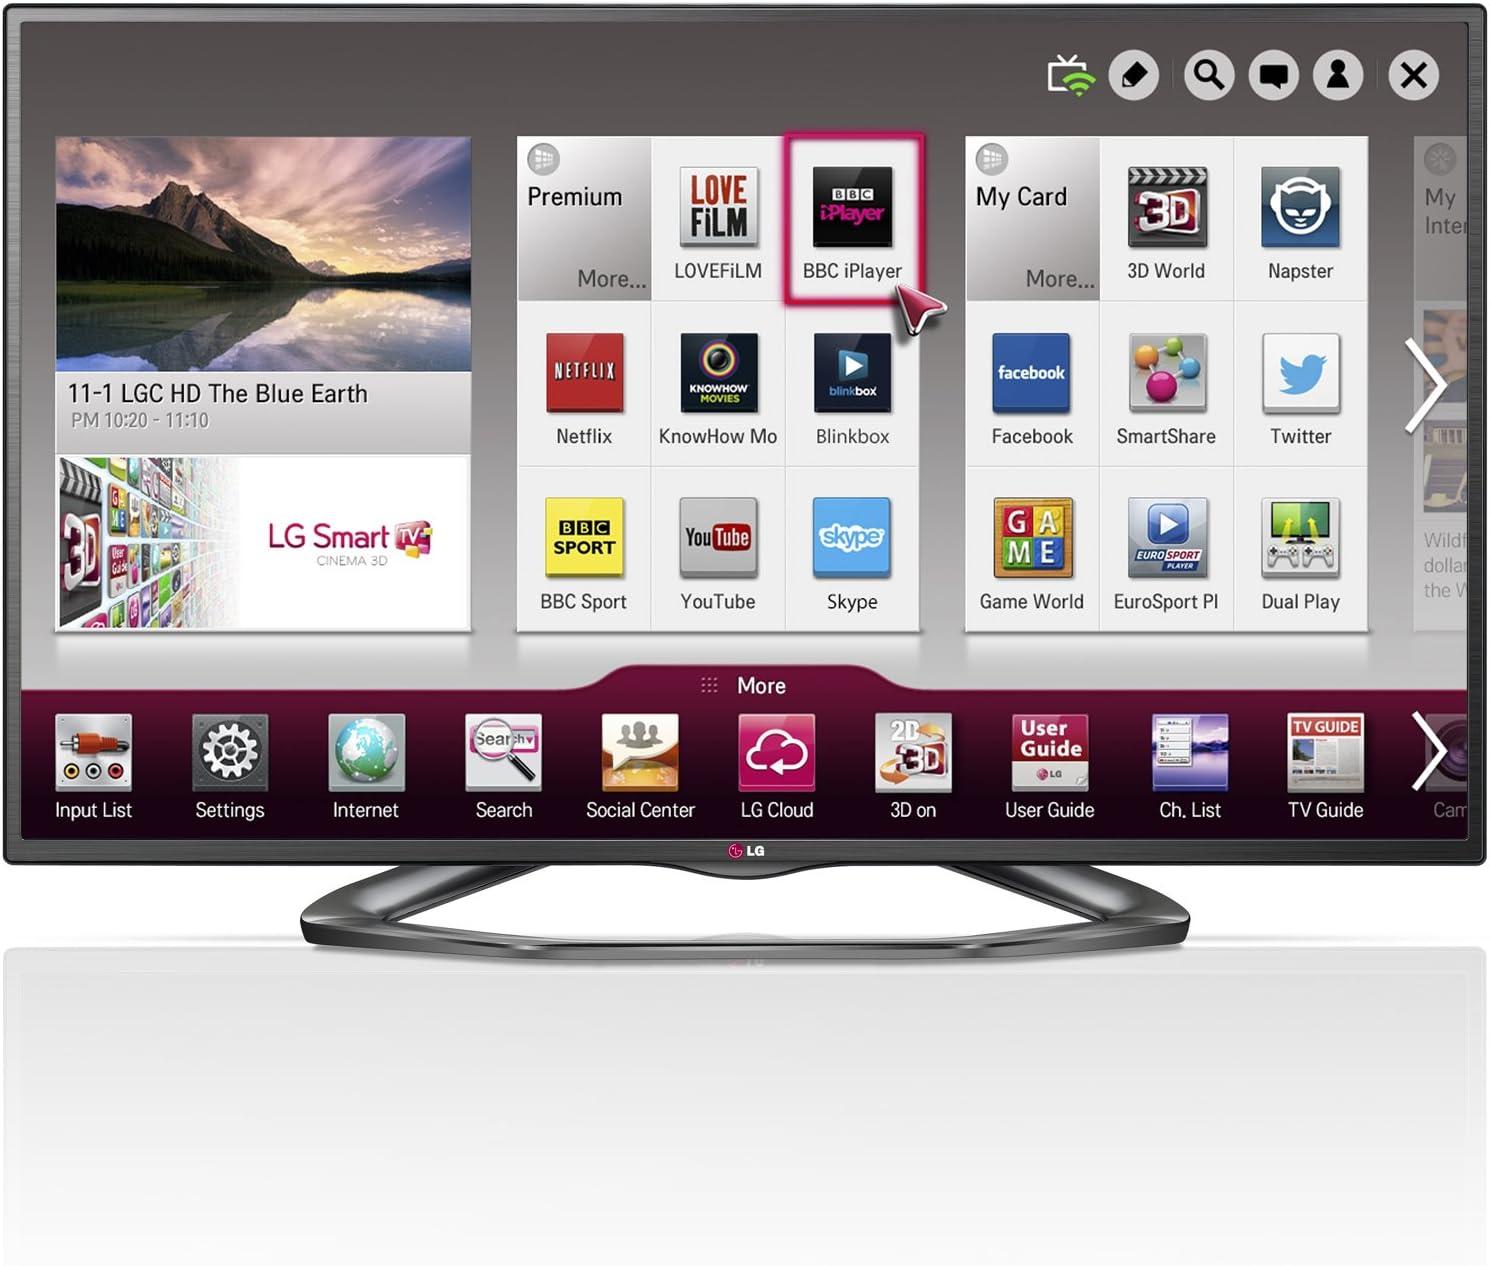 LG 47LA620V 47 Inch 3D LED Smart TV FHD Video Camera Ready WiFi ...